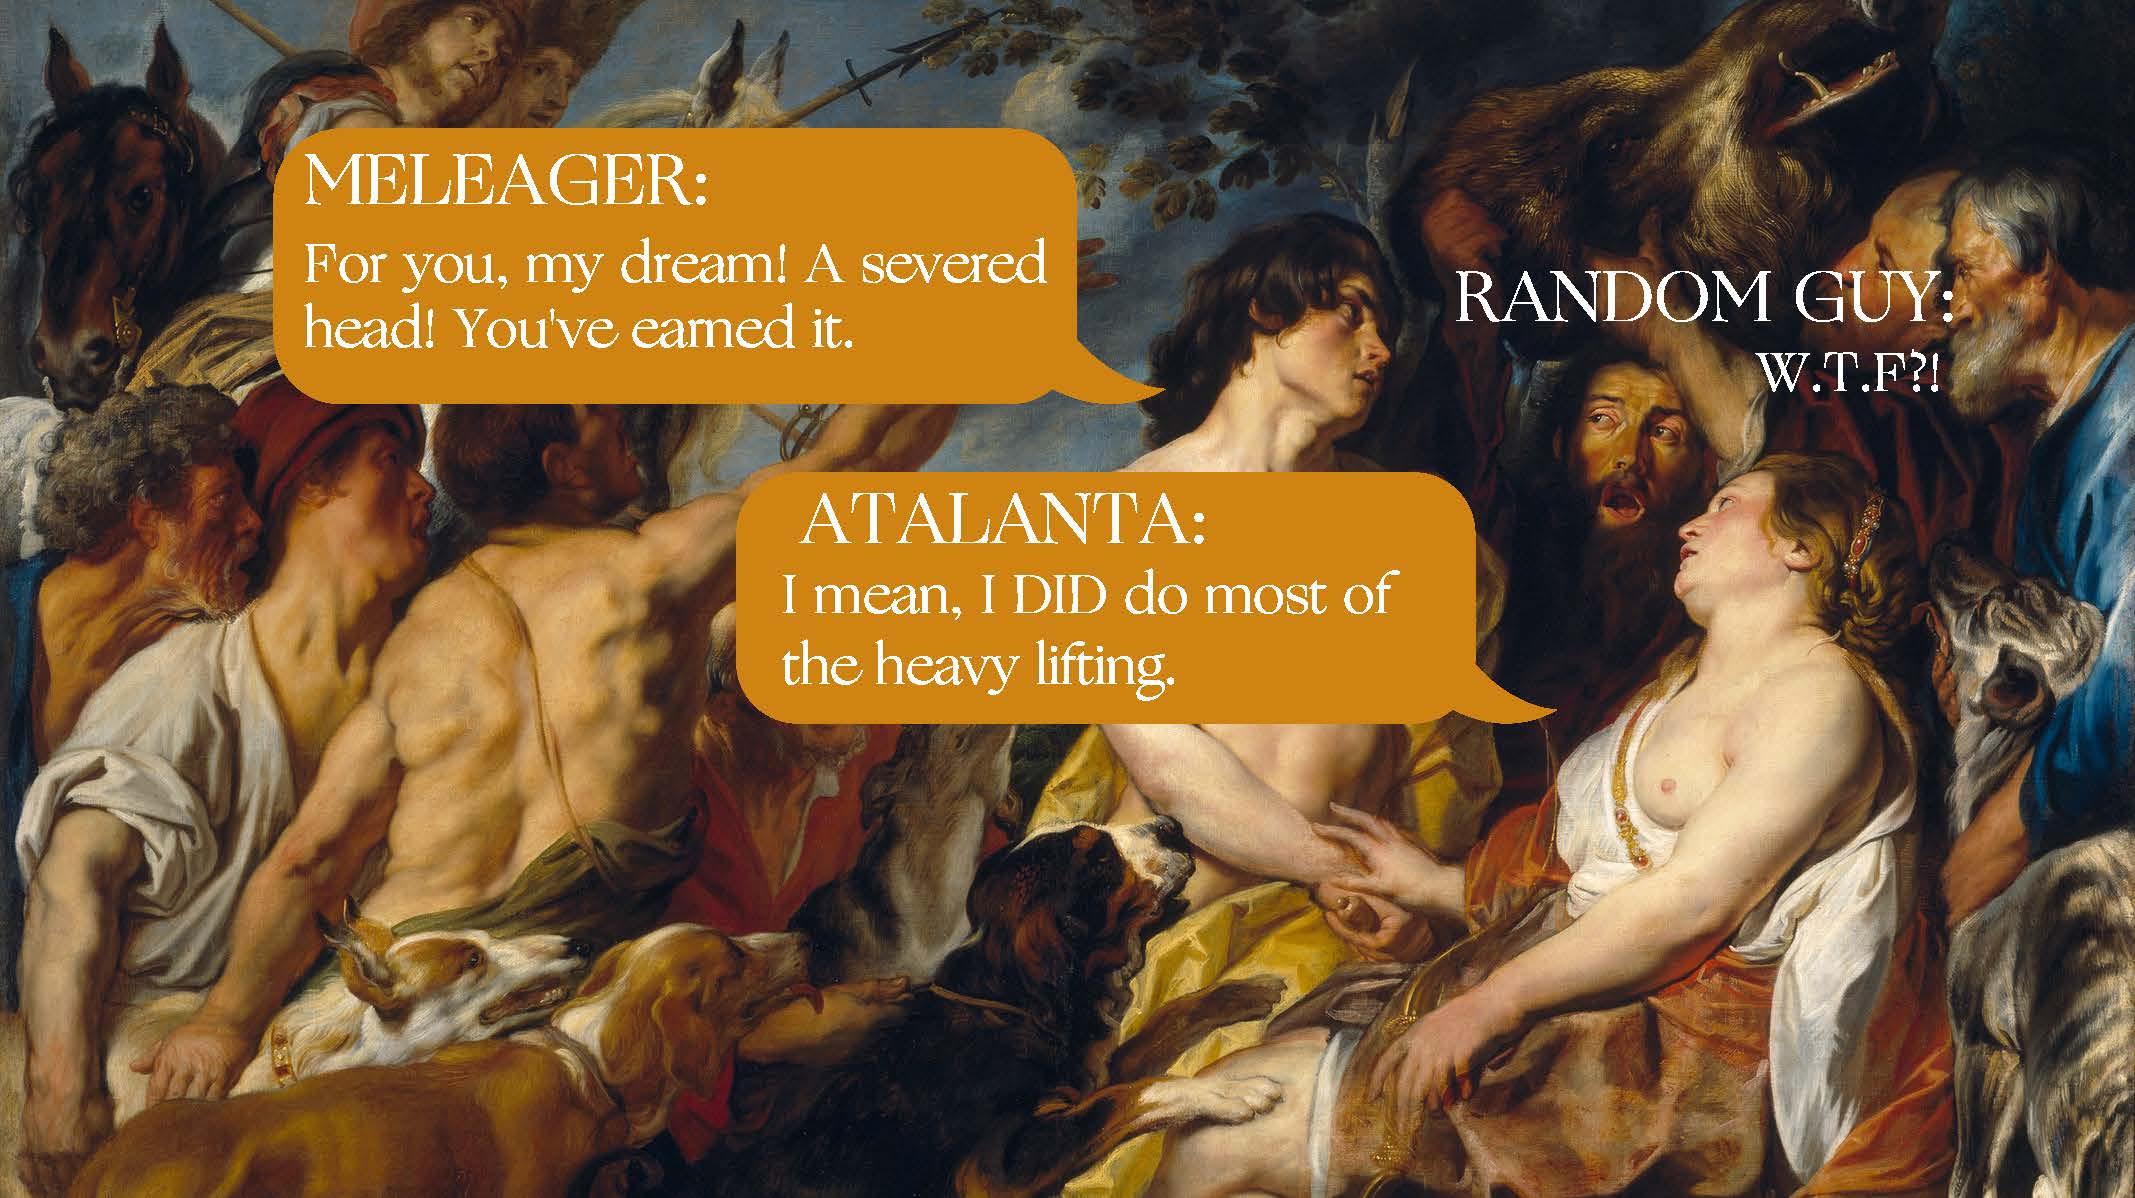 Meleager and Atalanta  by Jacob Jordaens (1620-1650).